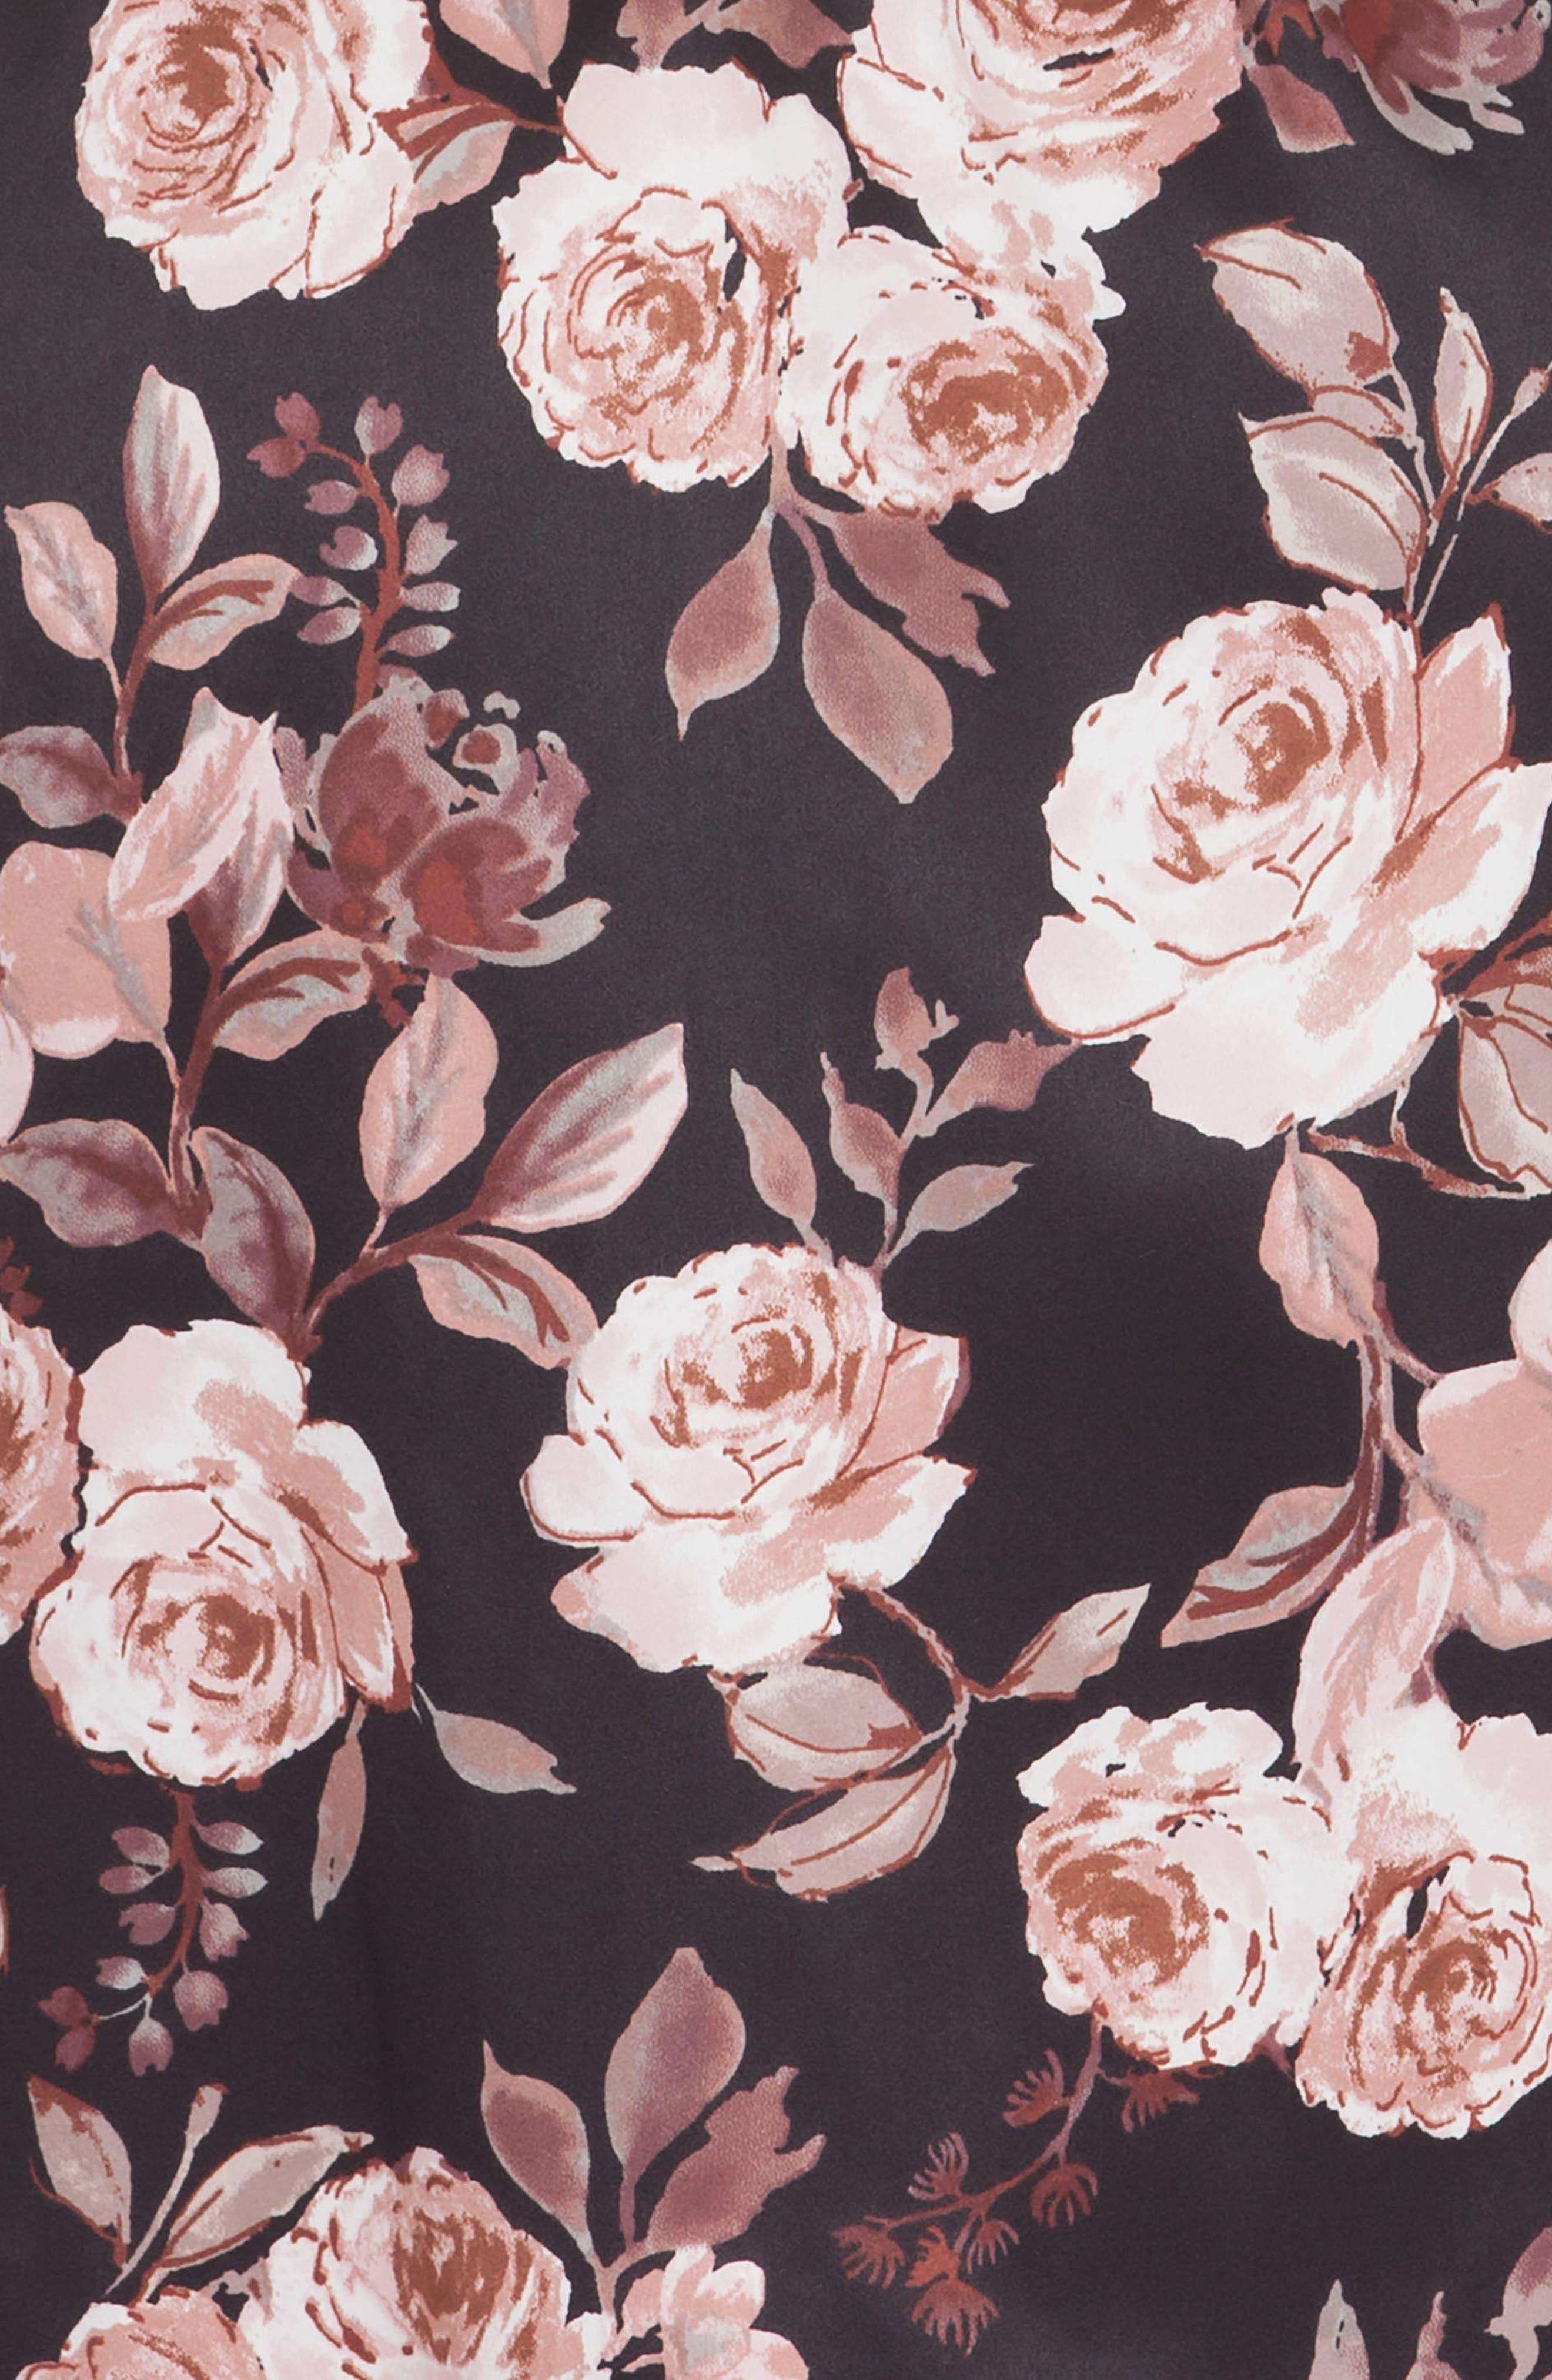 Floral Print Kimono Robe,                             Alternate thumbnail 4, color,                             Black Ground Rose Floral Print